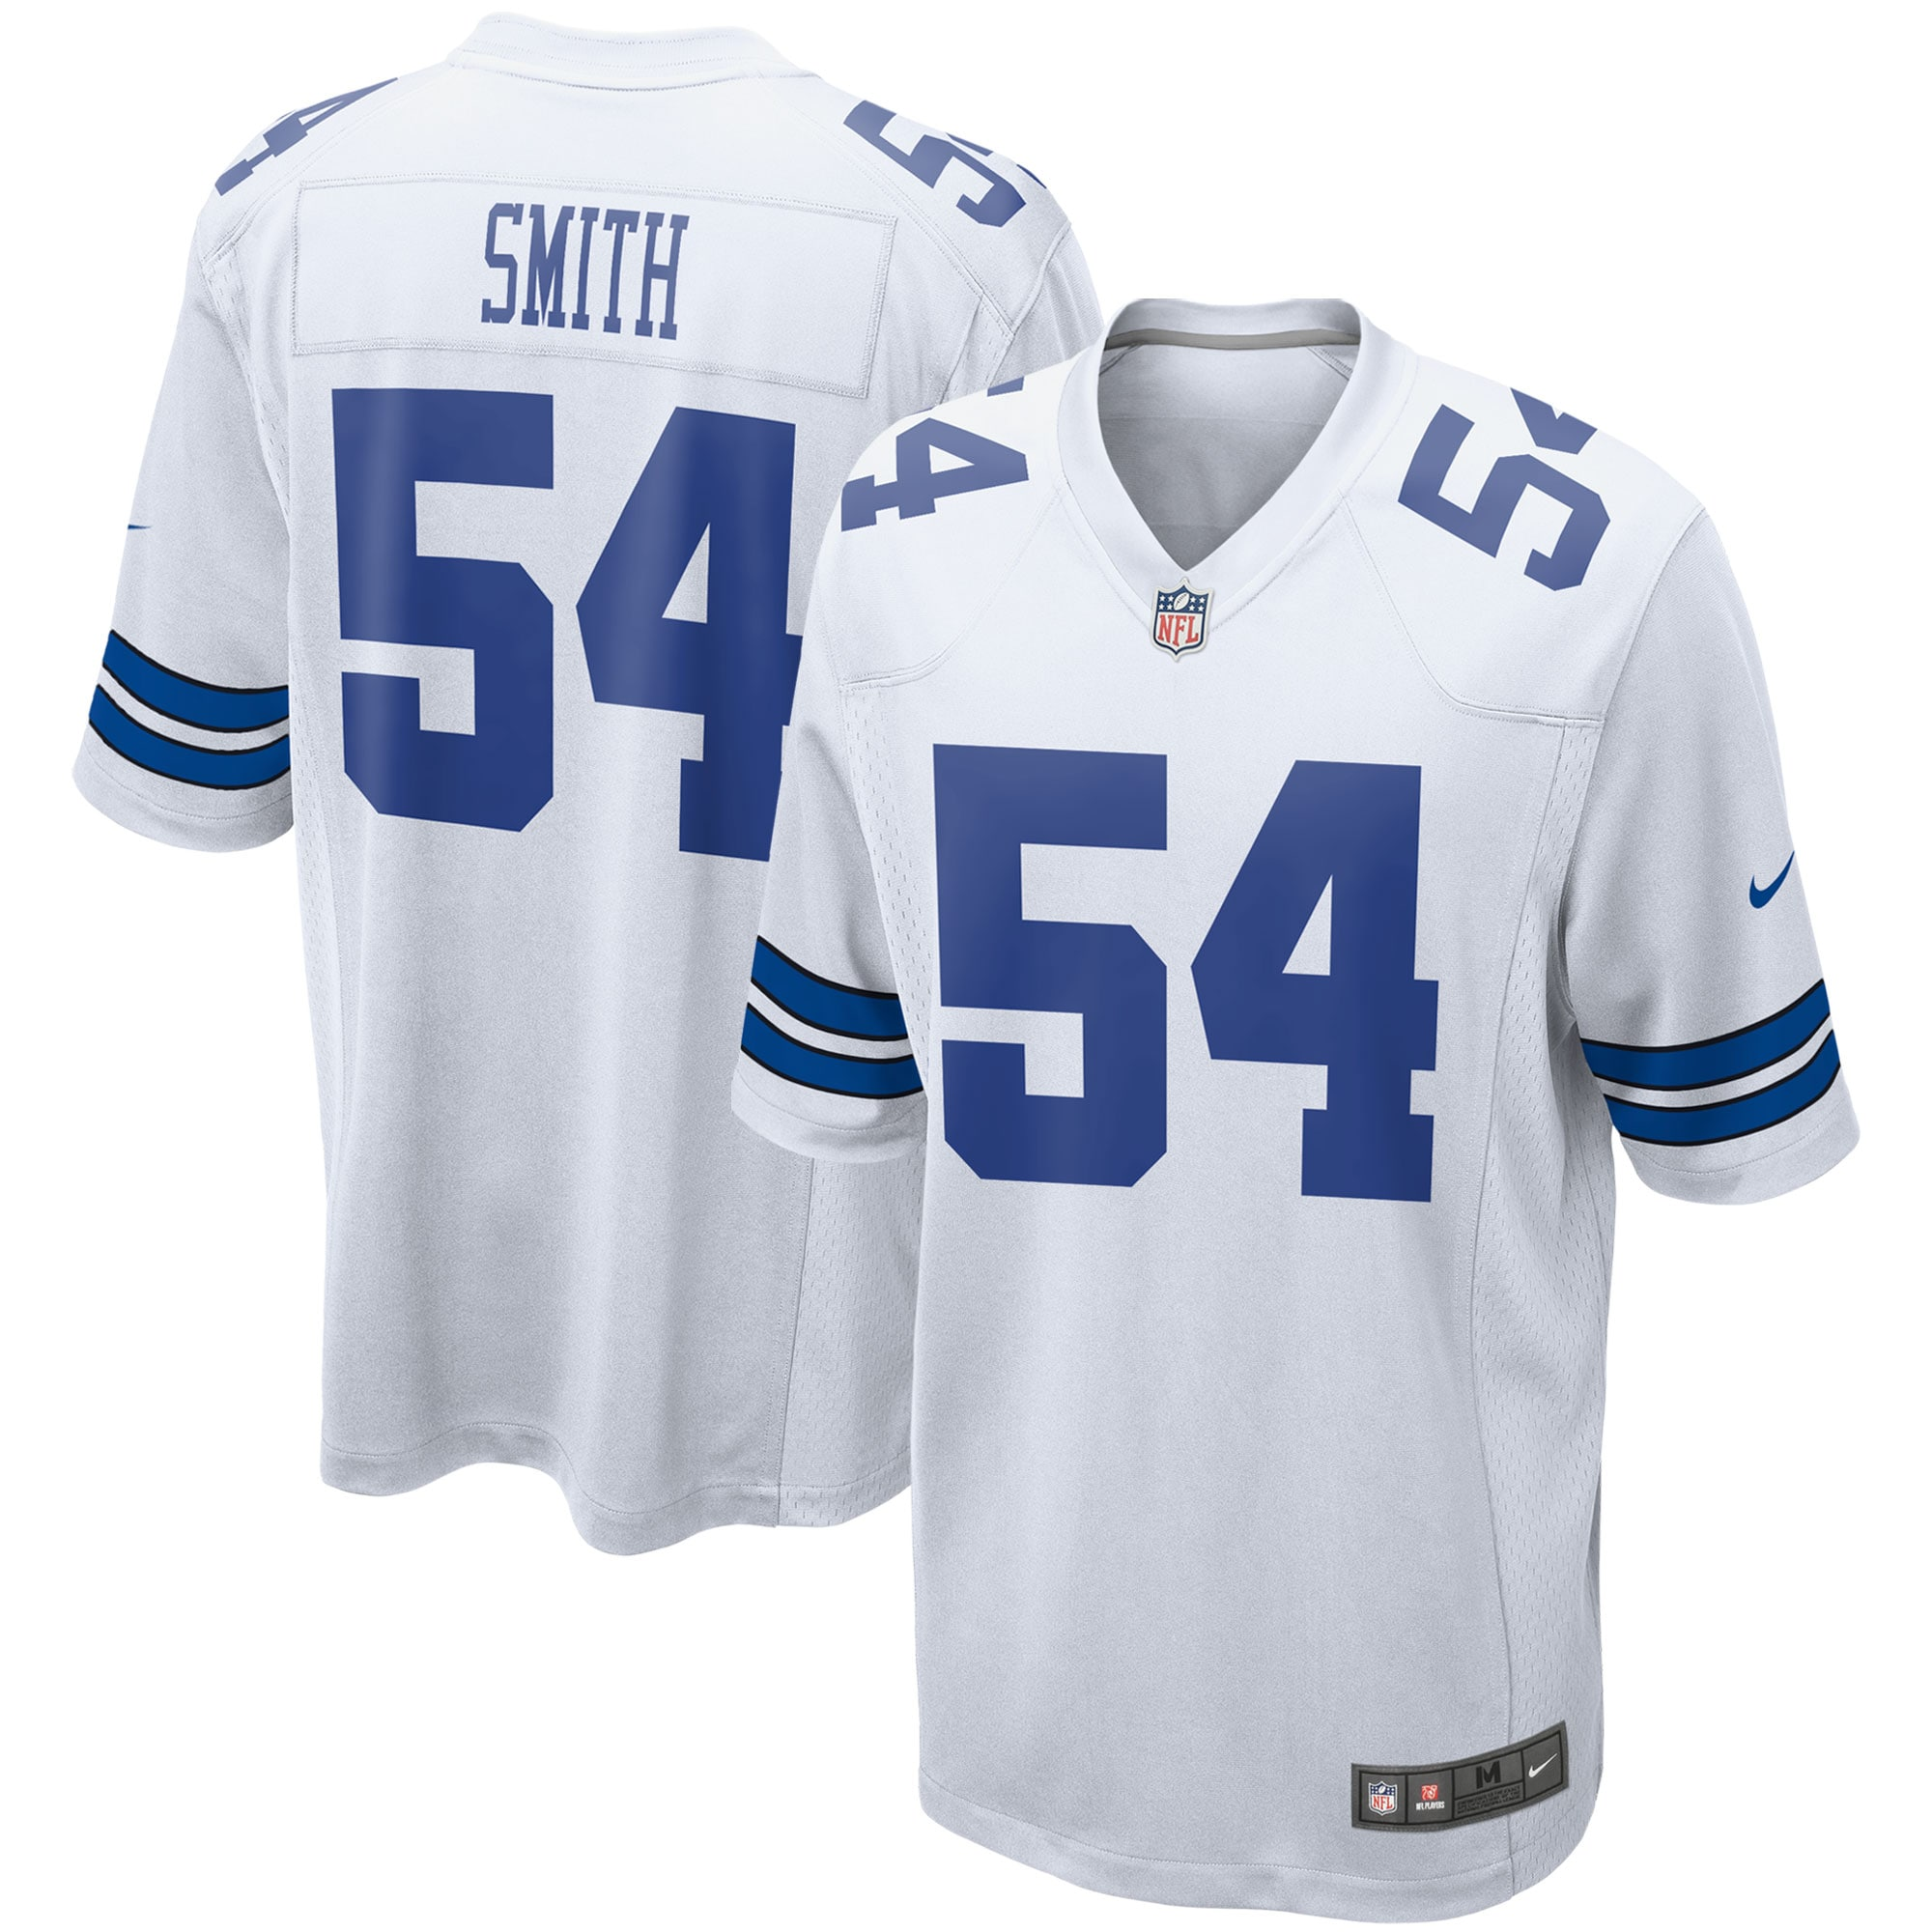 Jaylon Smith Dallas Cowboys Nike Game Team Jersey - White - Walmart.com